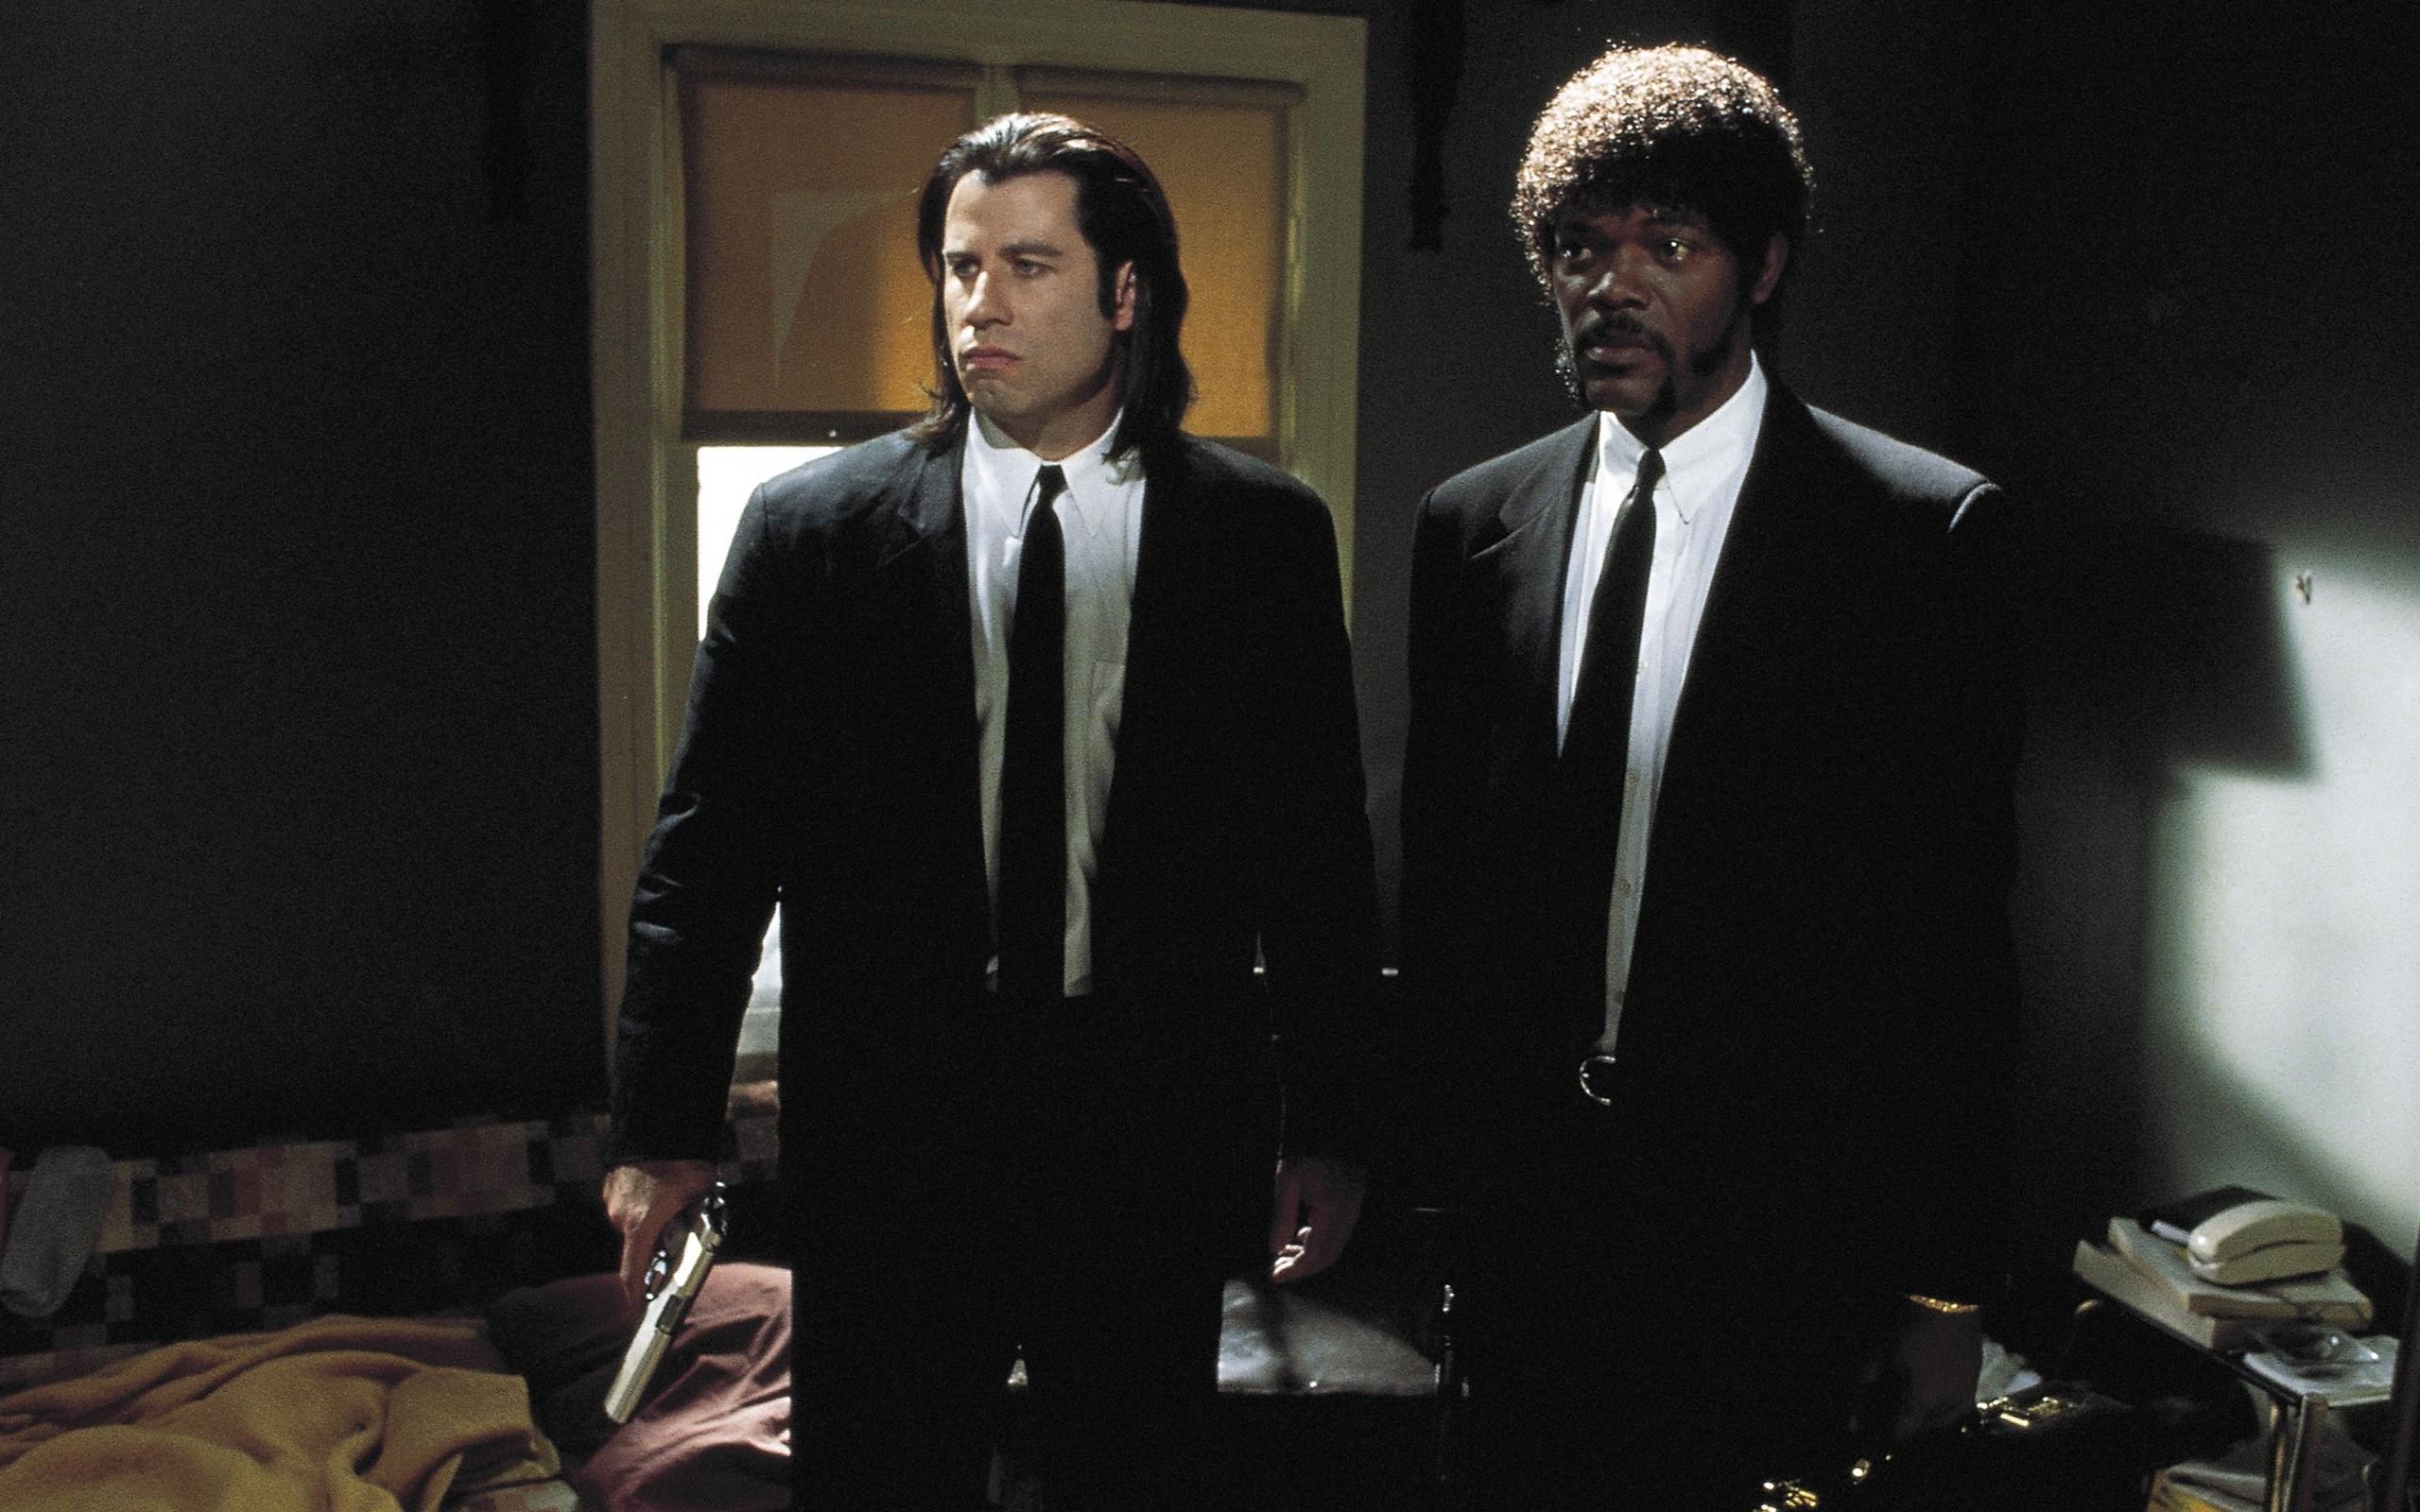 People 2560x1600 men actor movies film stills suits tie Pulp Fiction gun John Travolta Samuel L. Jackson Jules Winnfield Vincent Vega room Afro long hair gangsters Quentin Tarantino